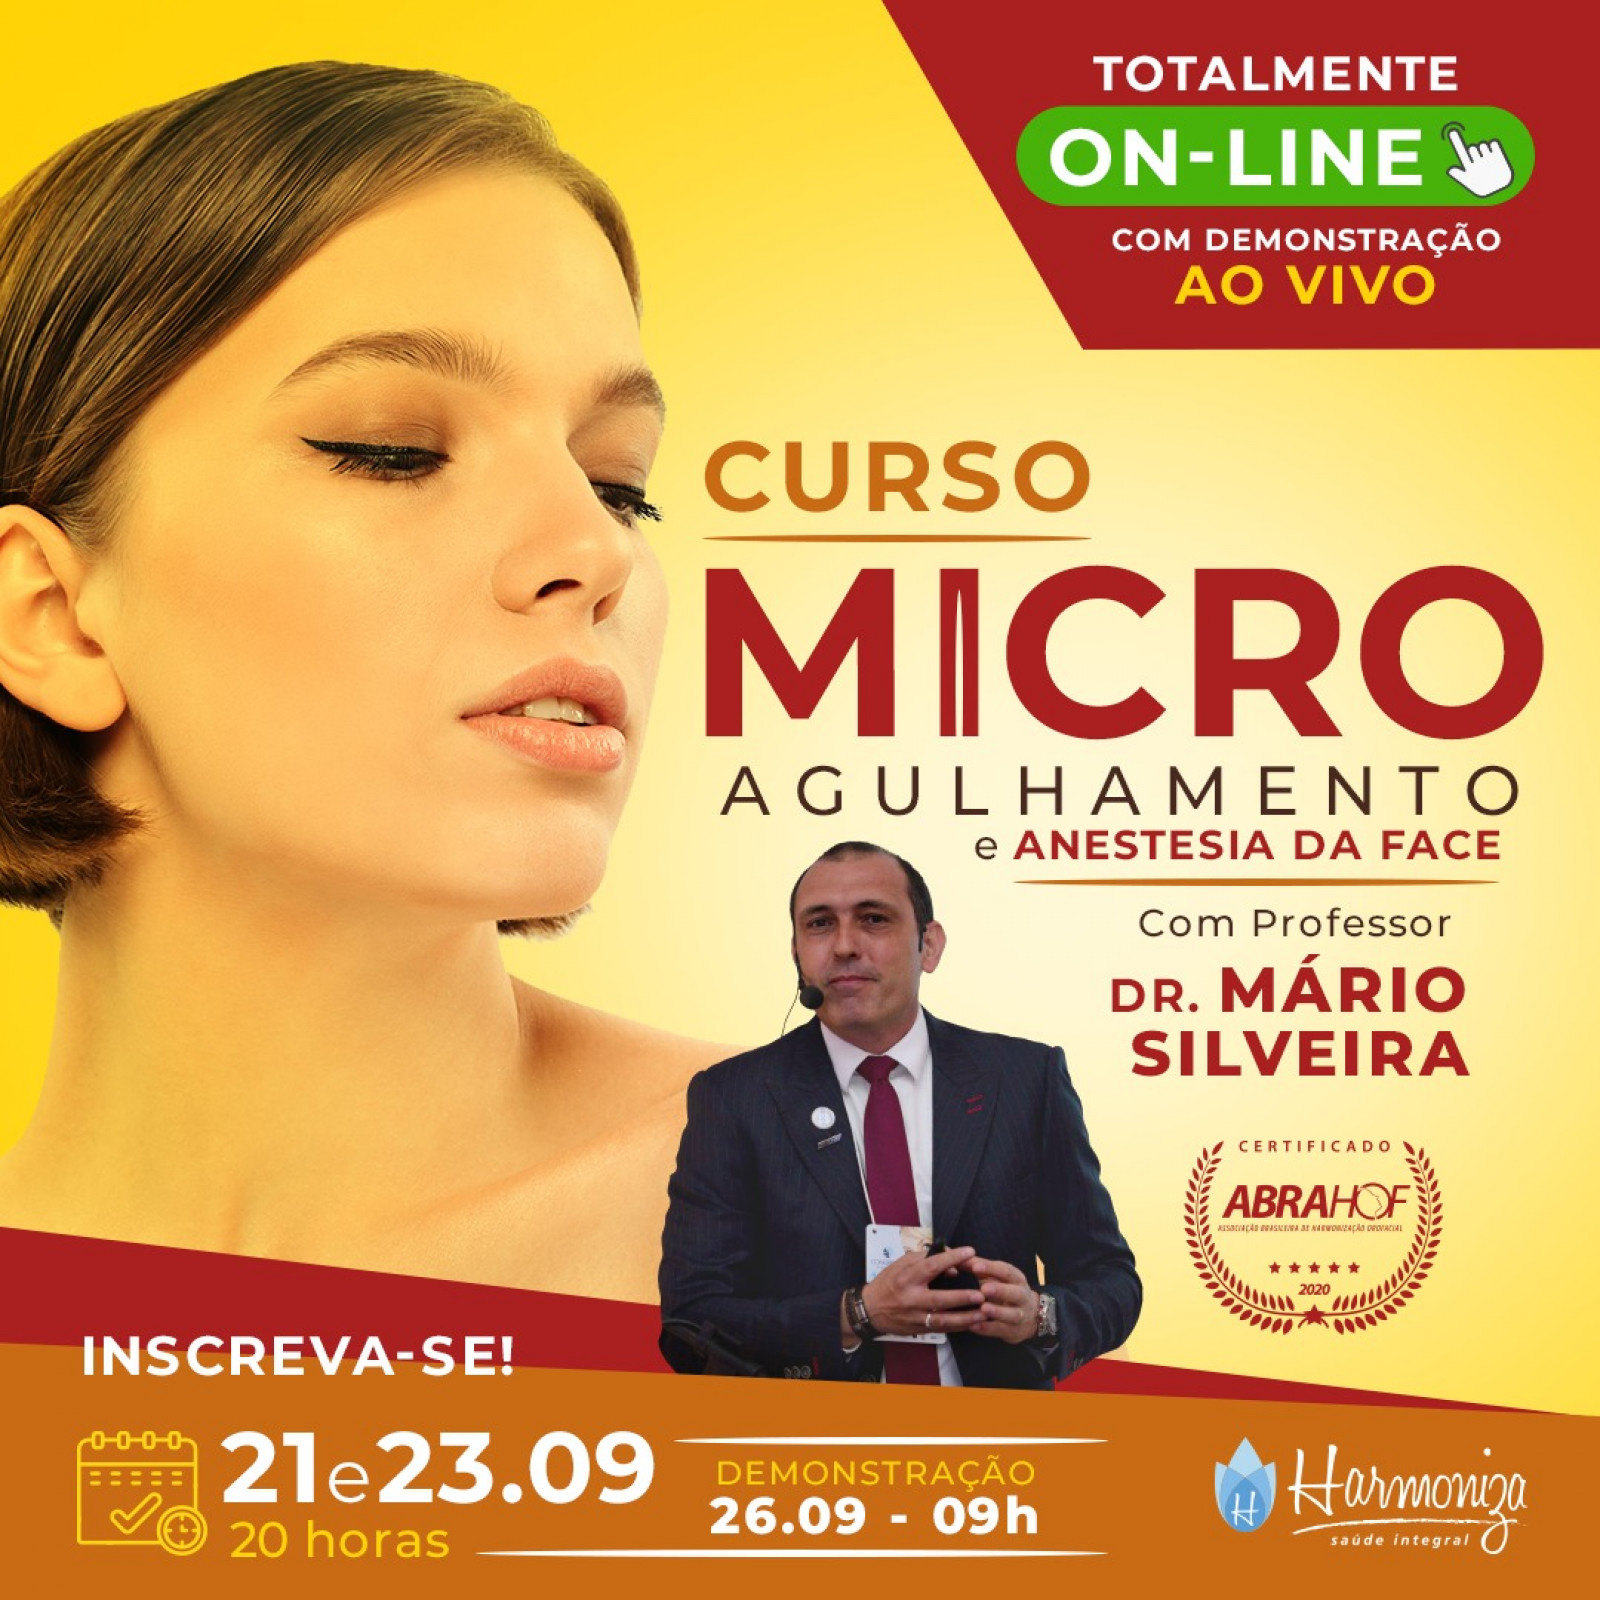 CURSO ON LINE MICROAGULHAMENTO E ANESTESIA DE FACE